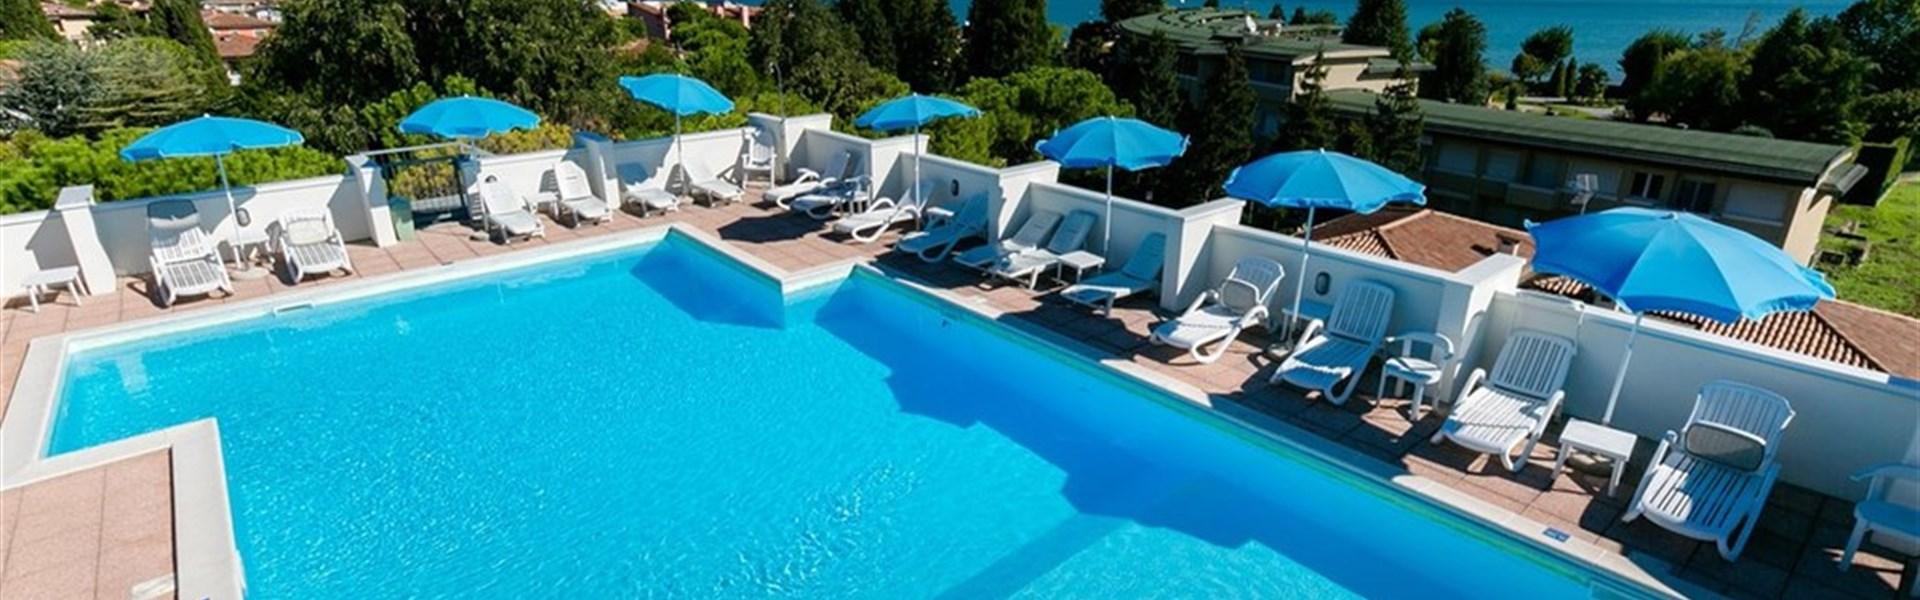 Marco Polo - Hotel Alfieri -